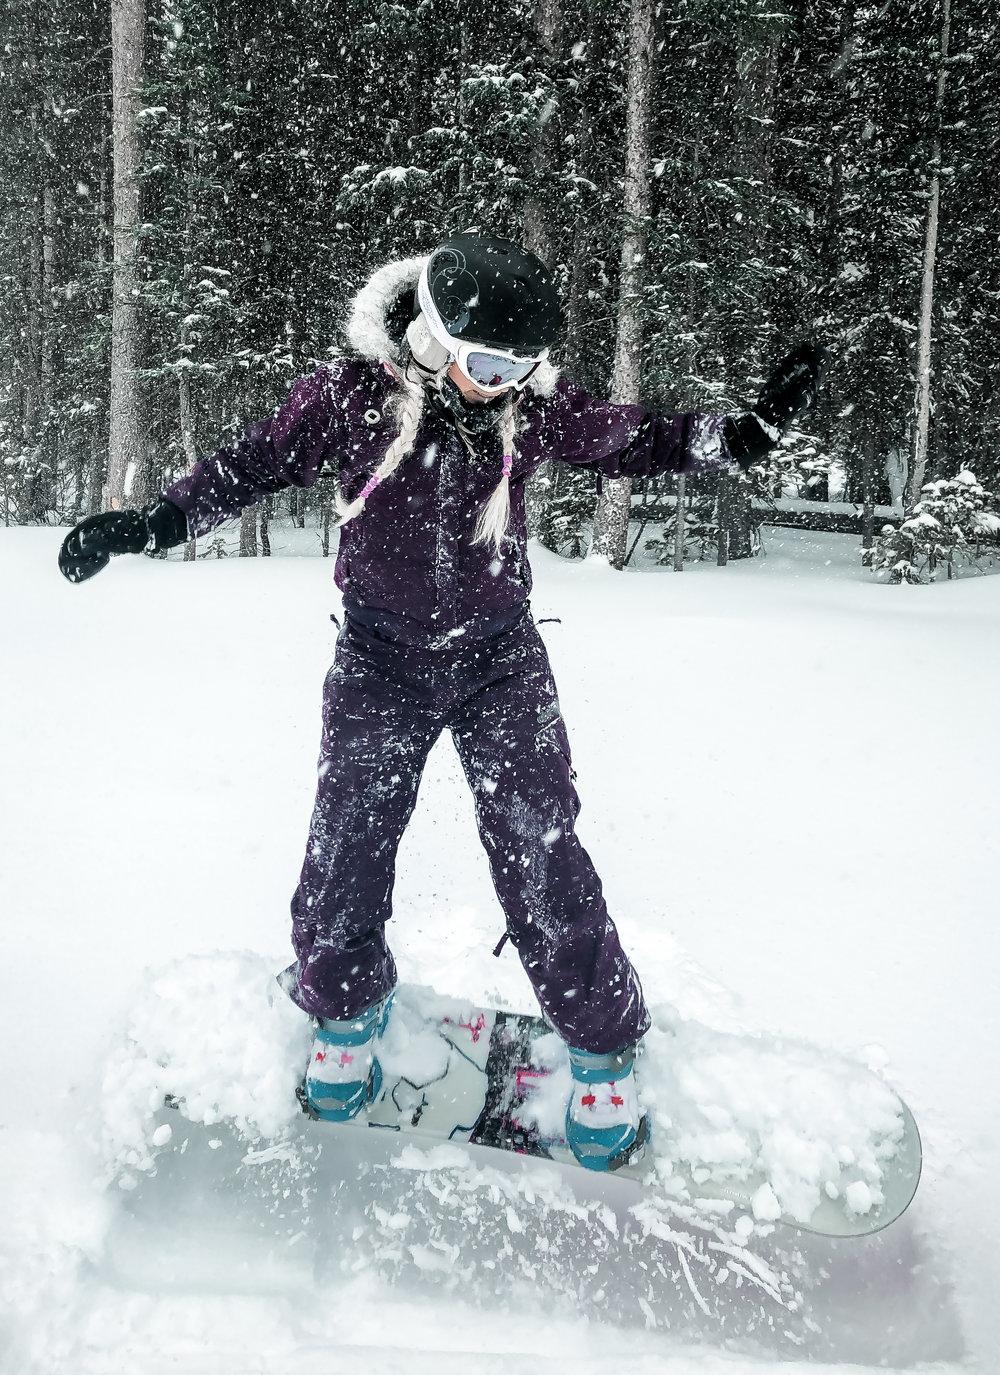 Snowboarding in Winter Park